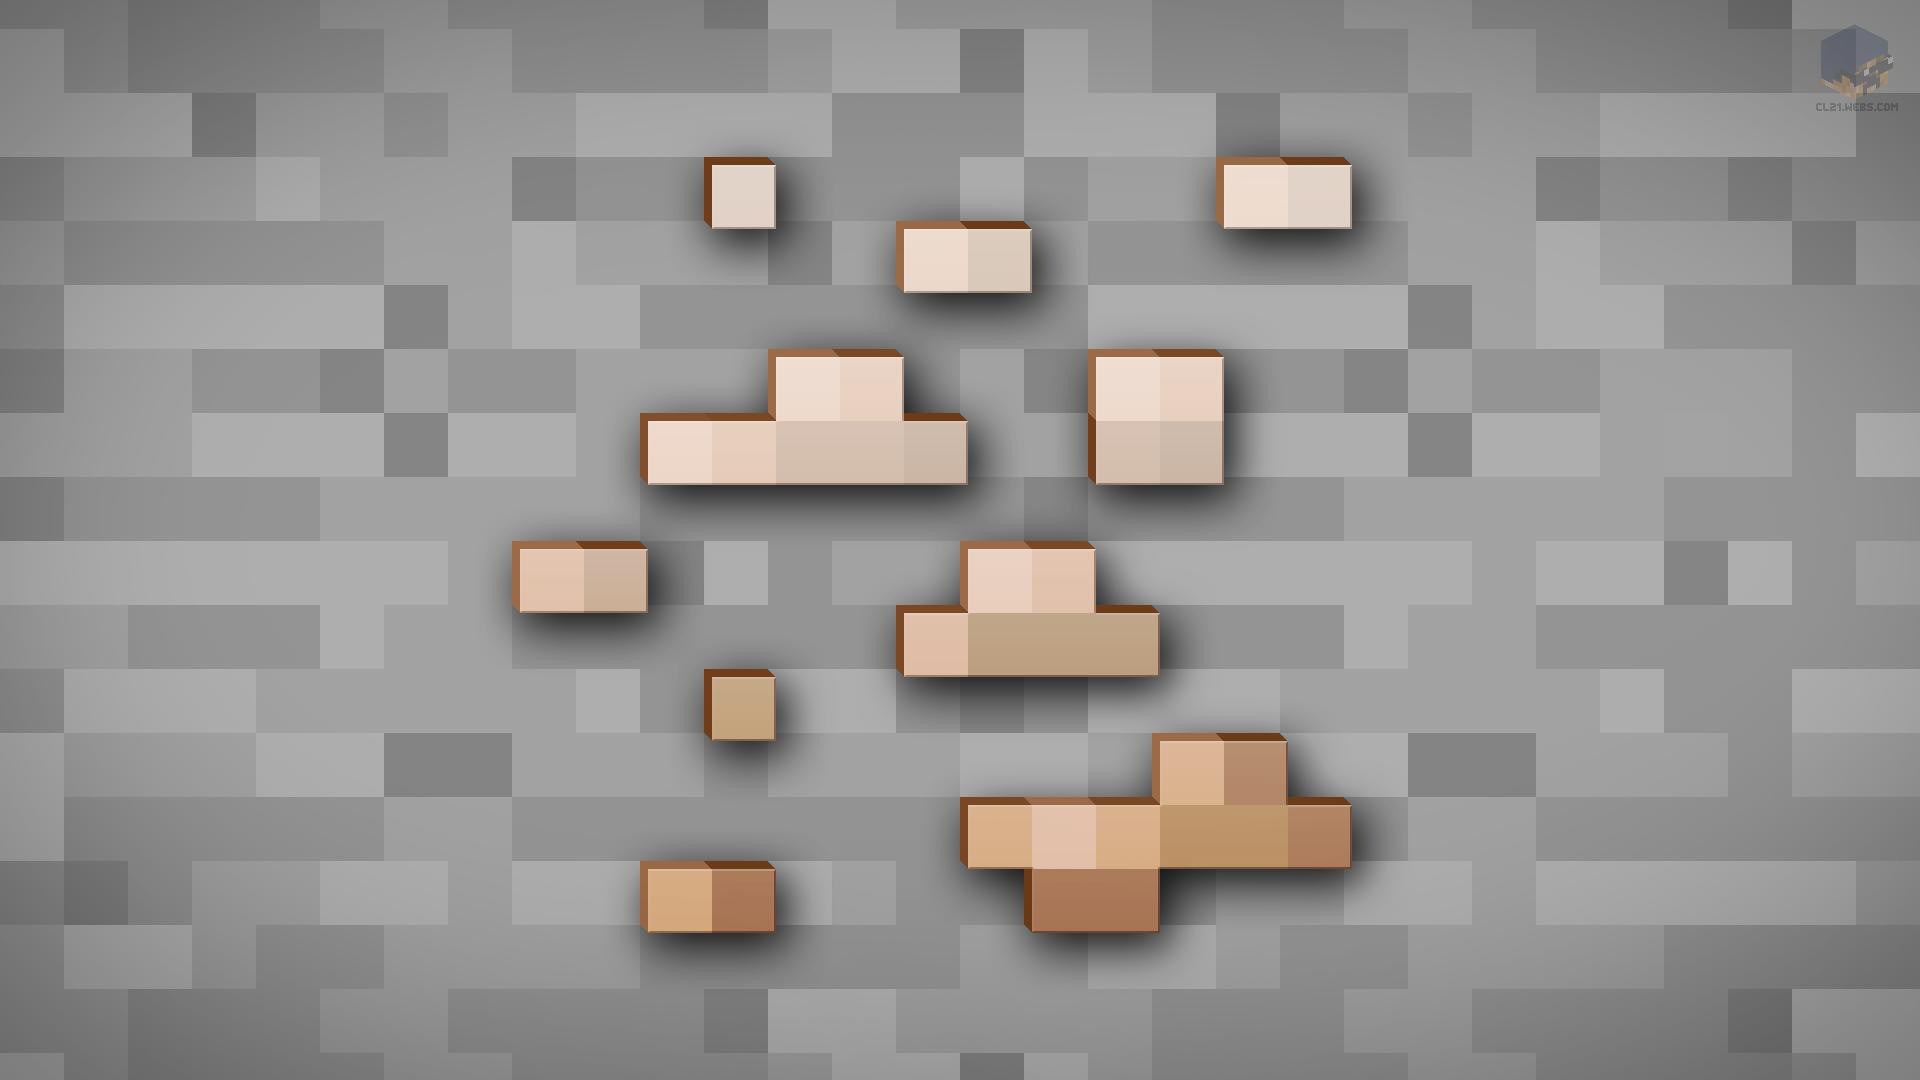 Minecraft Demir Hesap Resmi